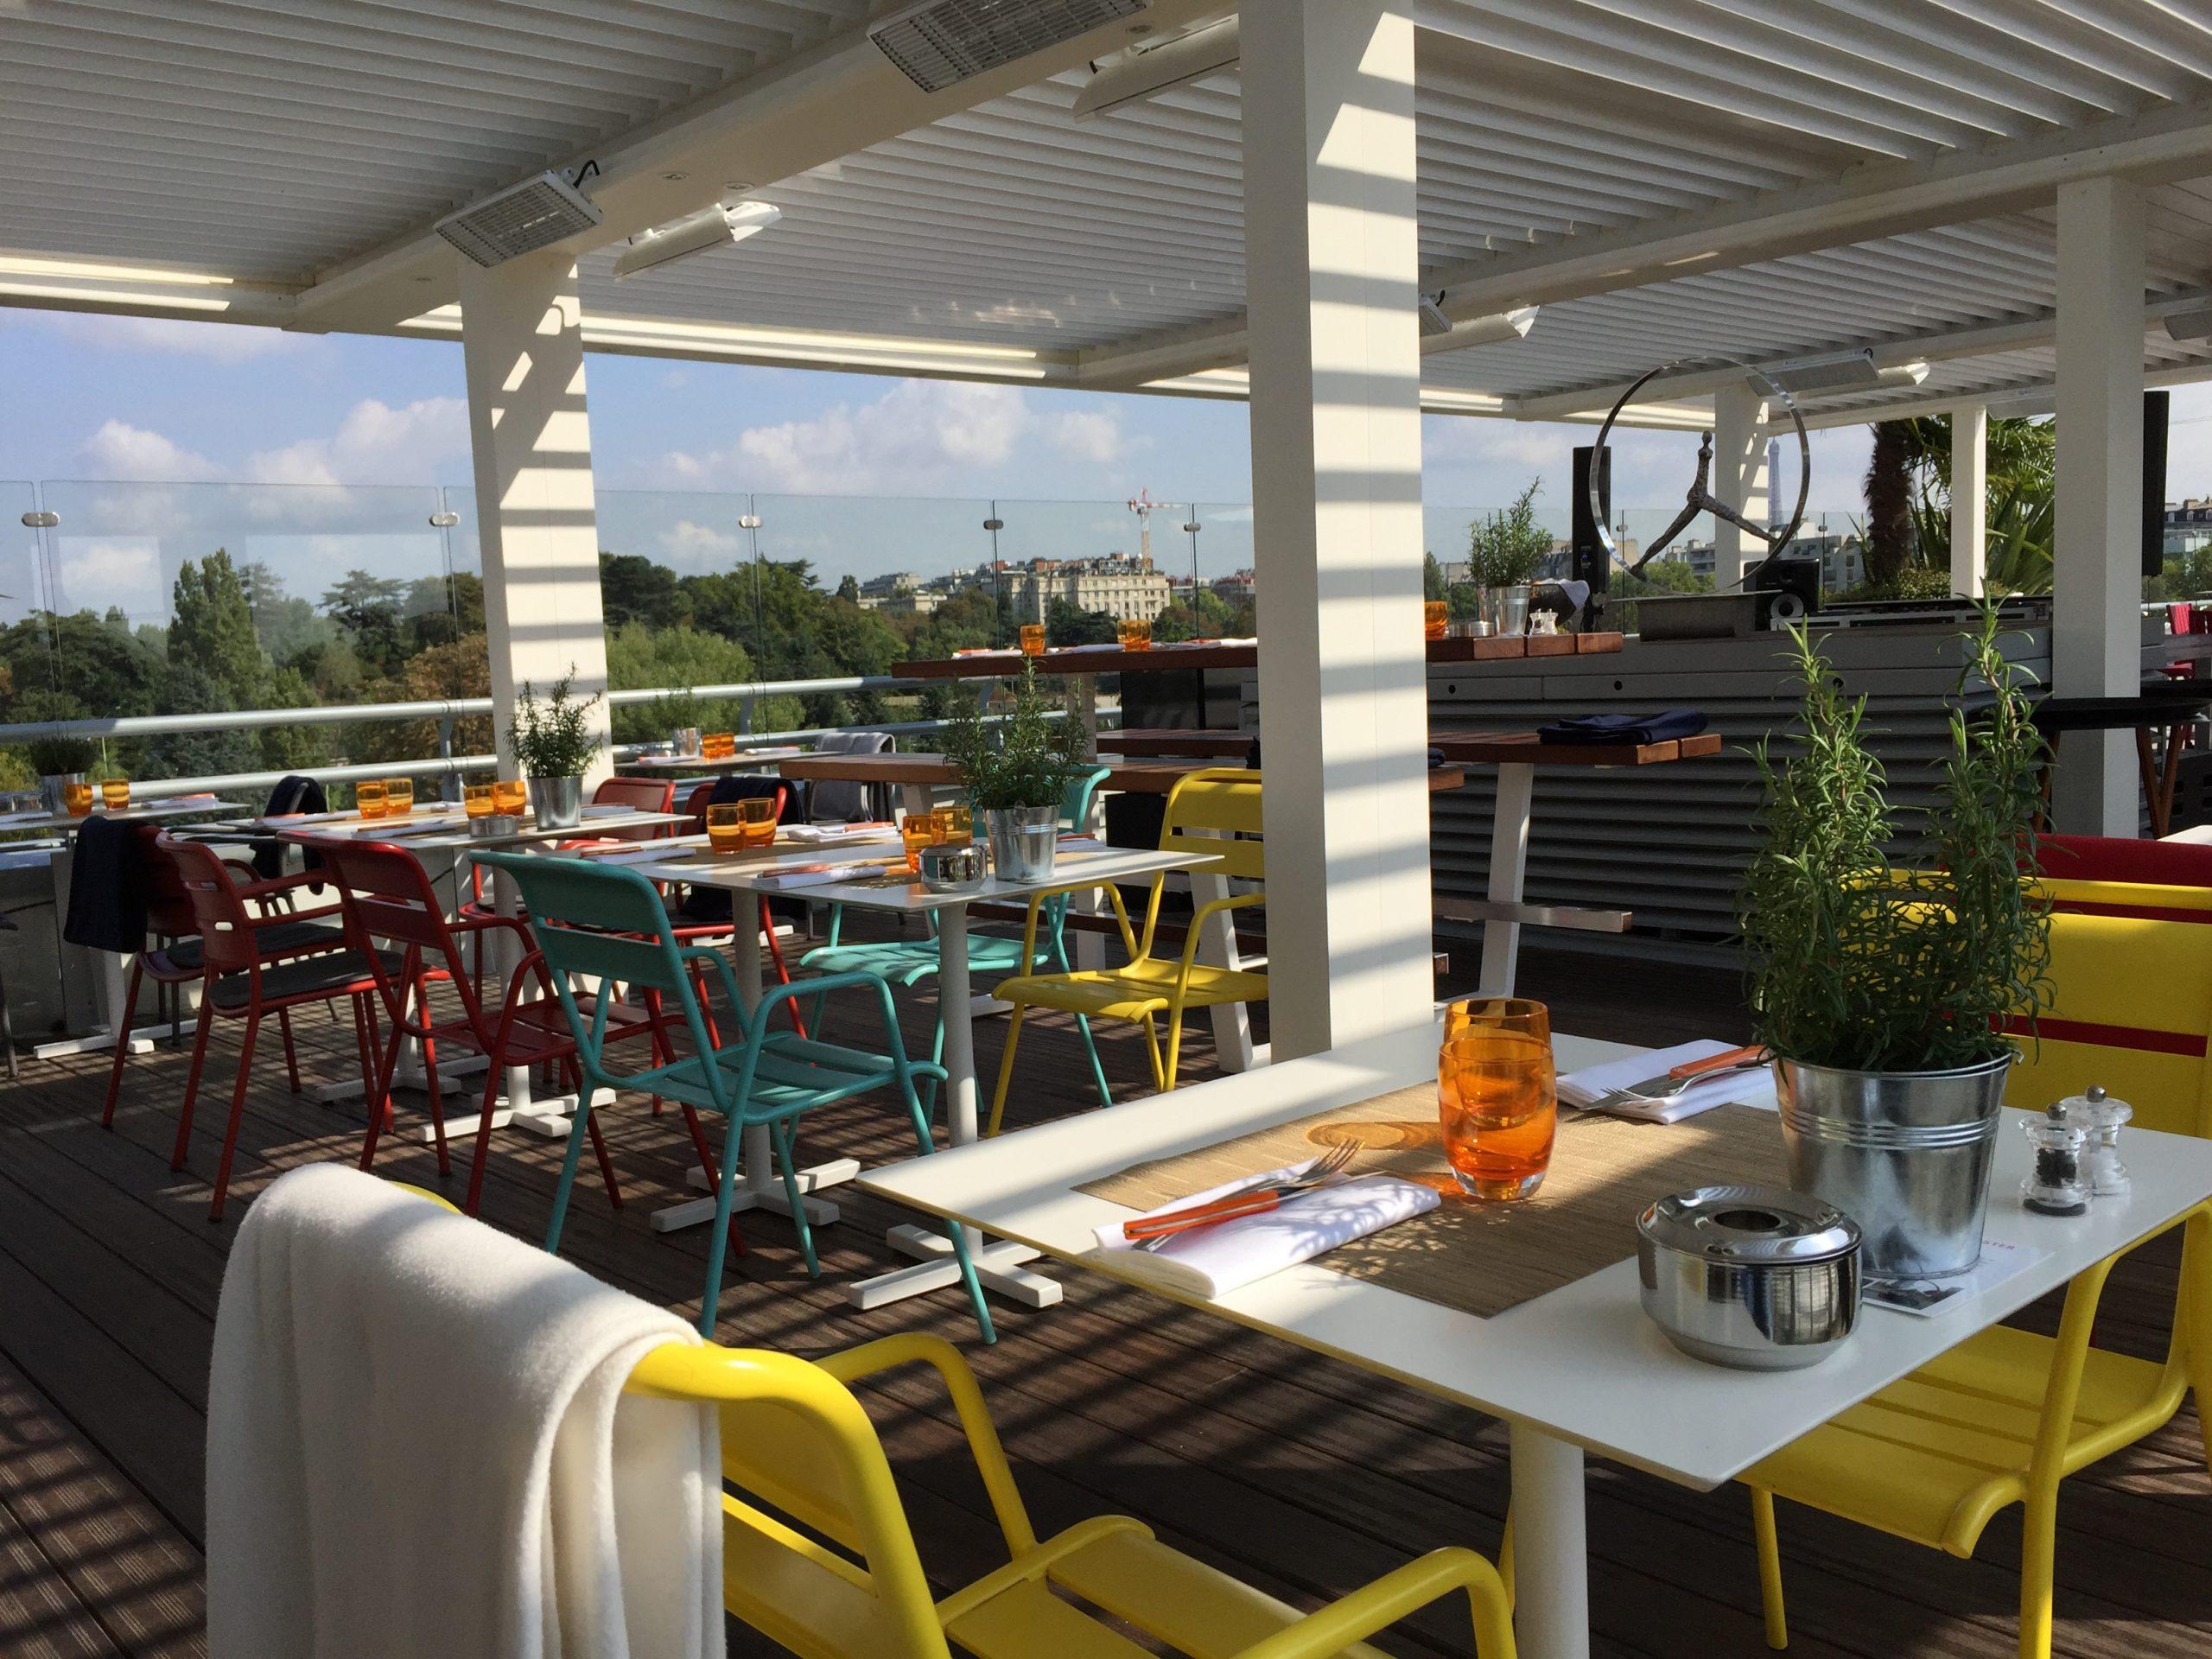 Hotel Molitor Mgallery Restaurant – Fancy Oli intérieur Restaurant Piscine Molitor